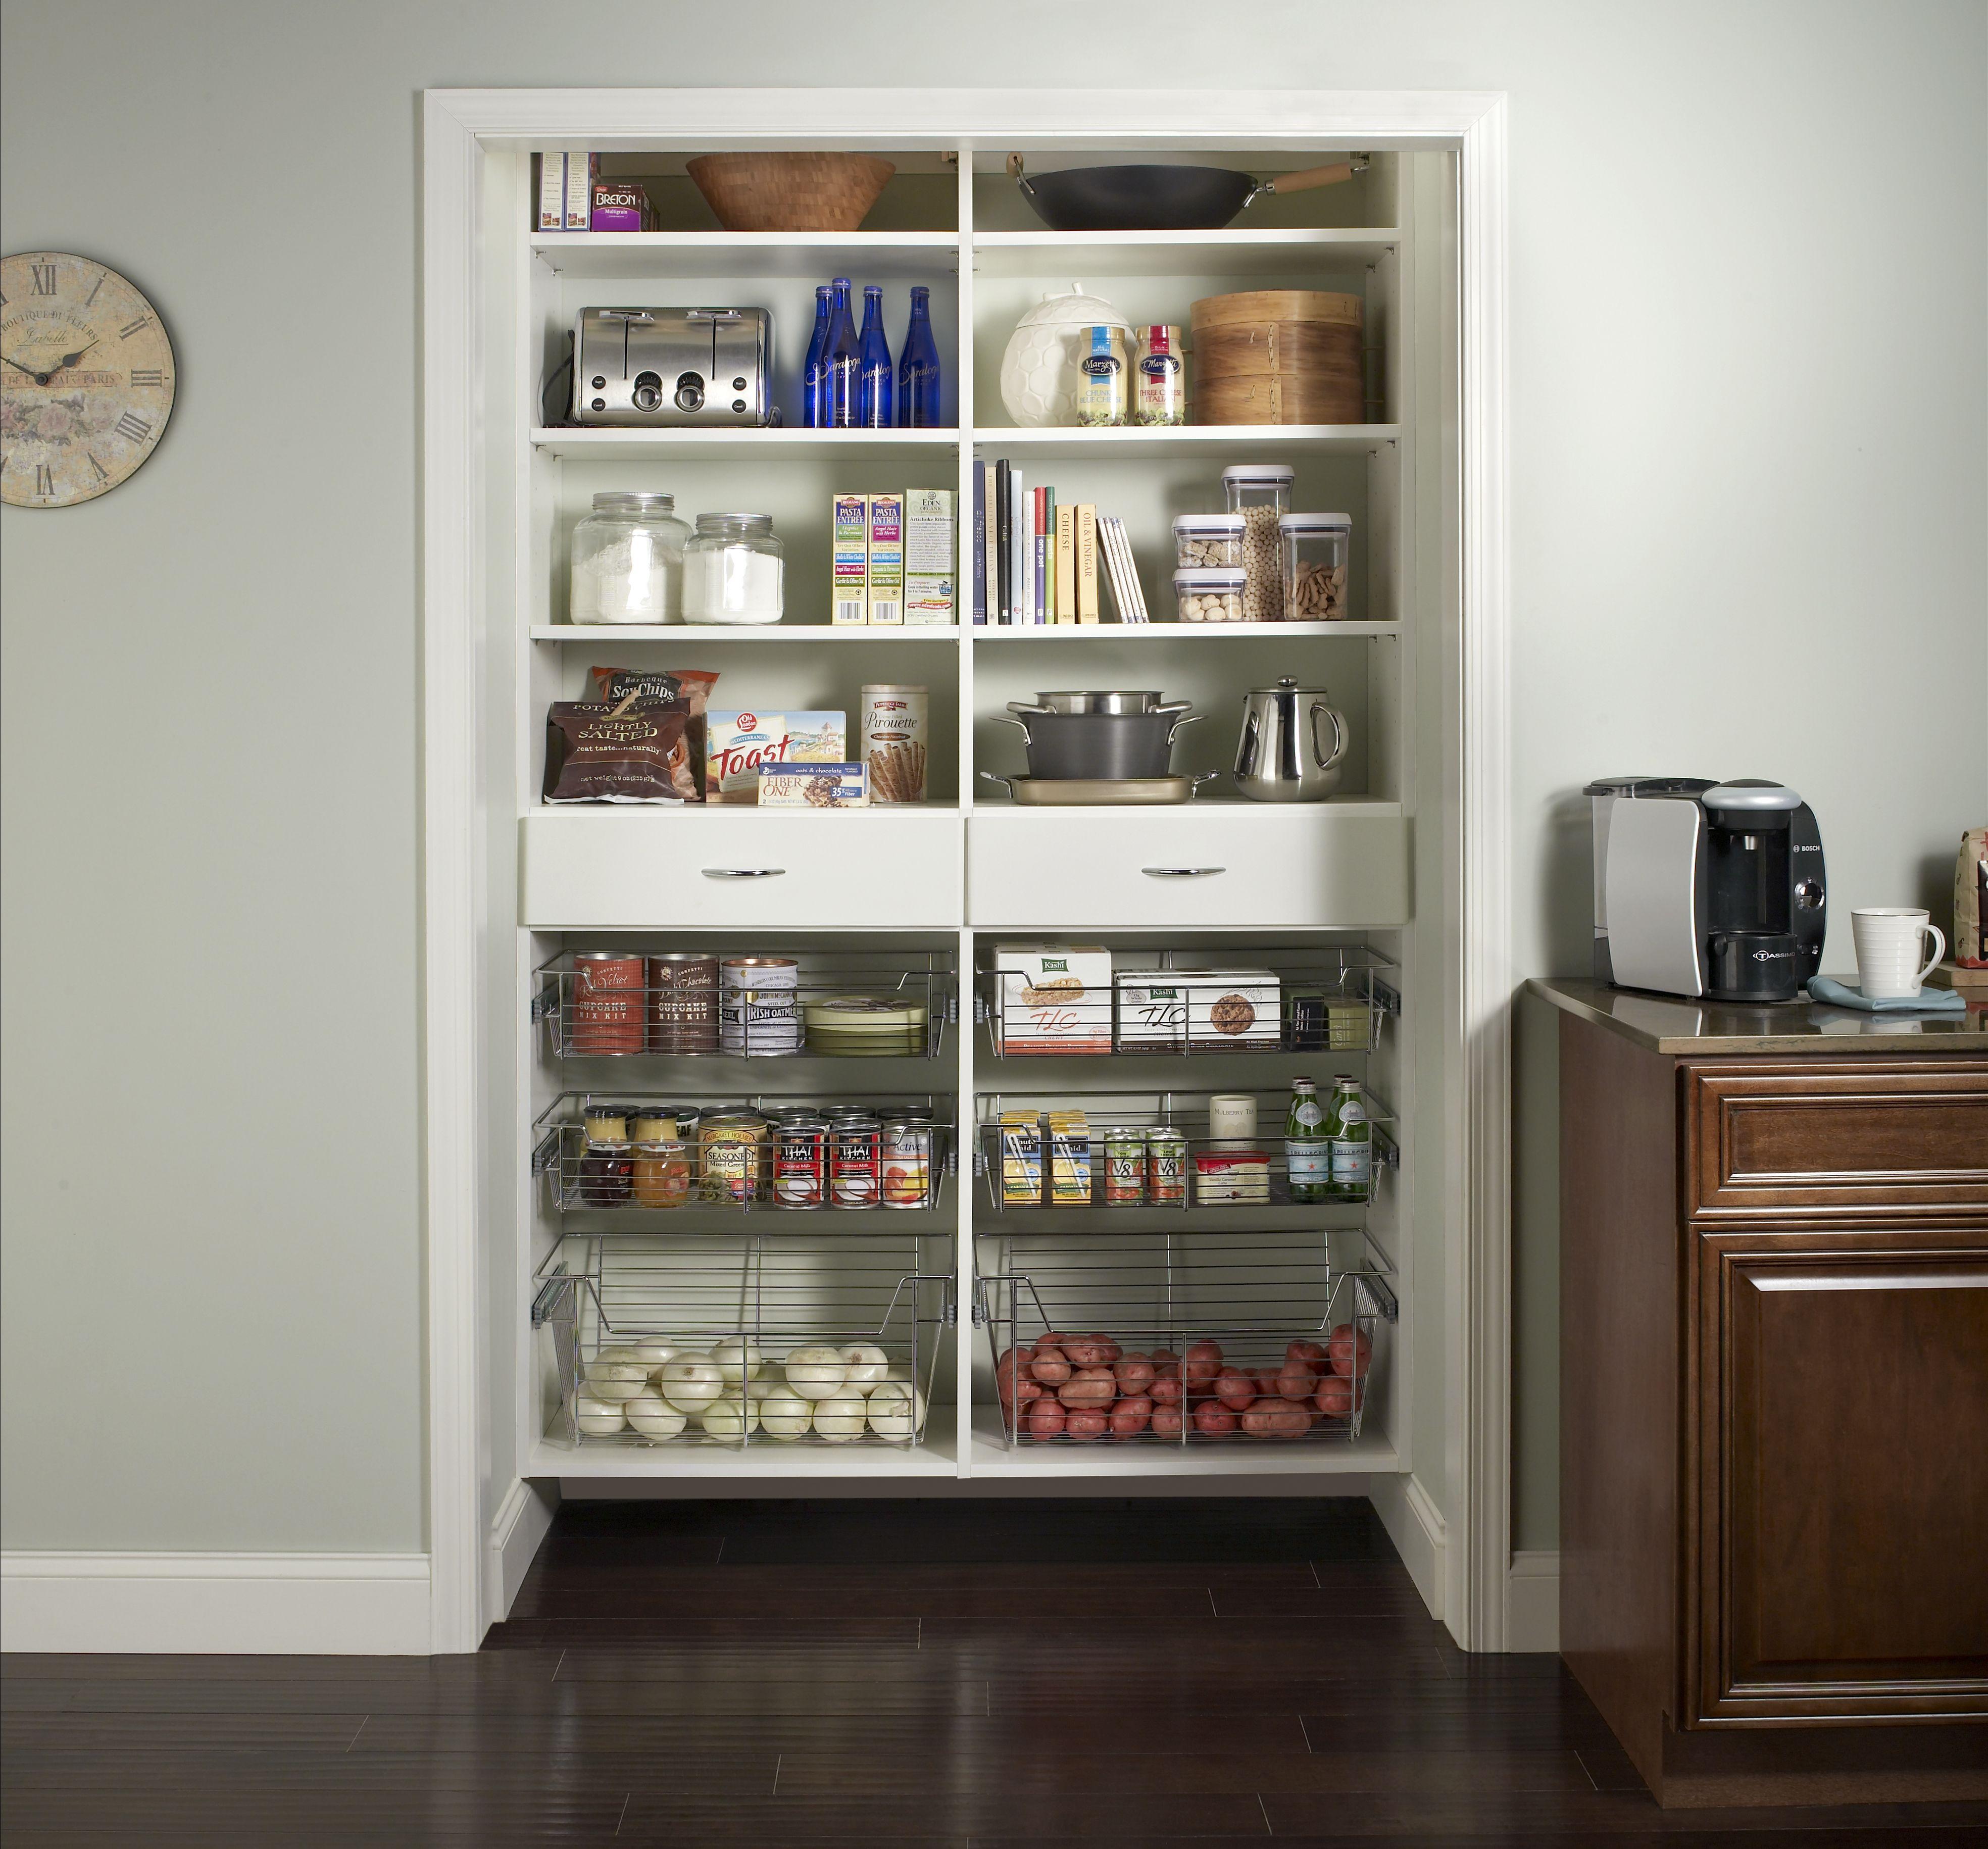 Kitchen Cabinets Wilmington Nc: White Pantry Contoured Edge